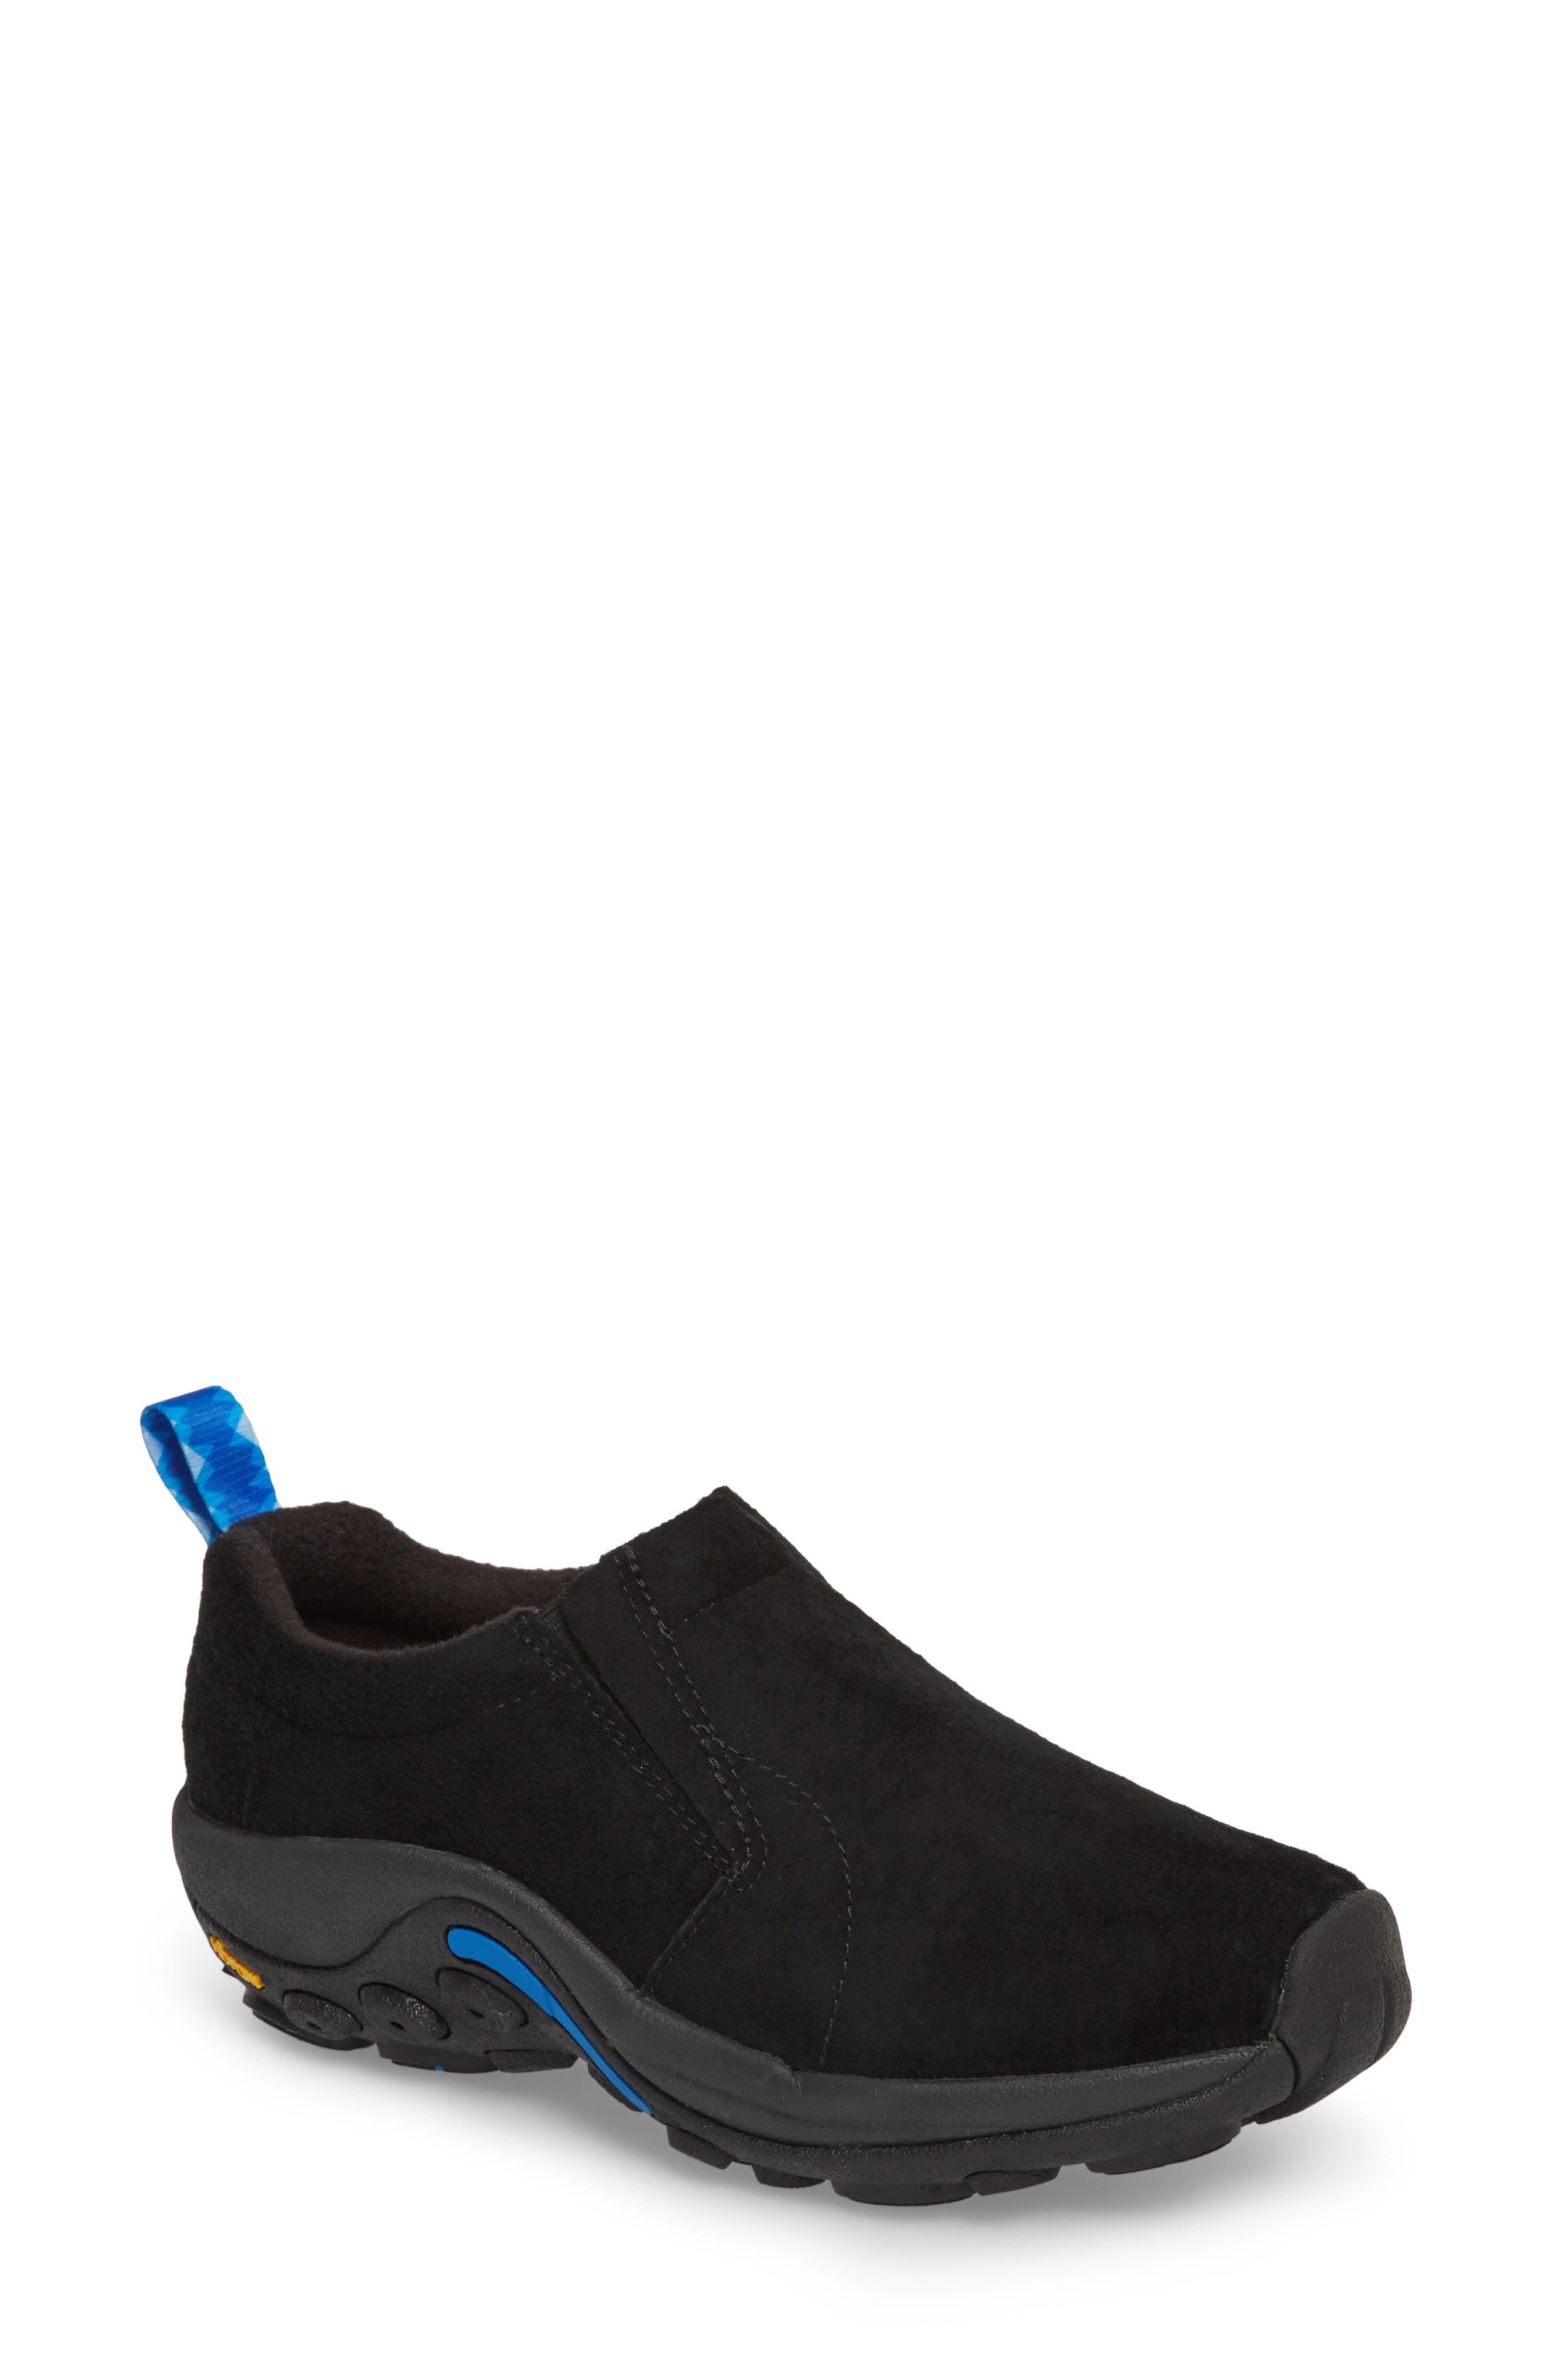 Jungle Moc Ice Waterproof Sneaker,                         Main,                         color, 001